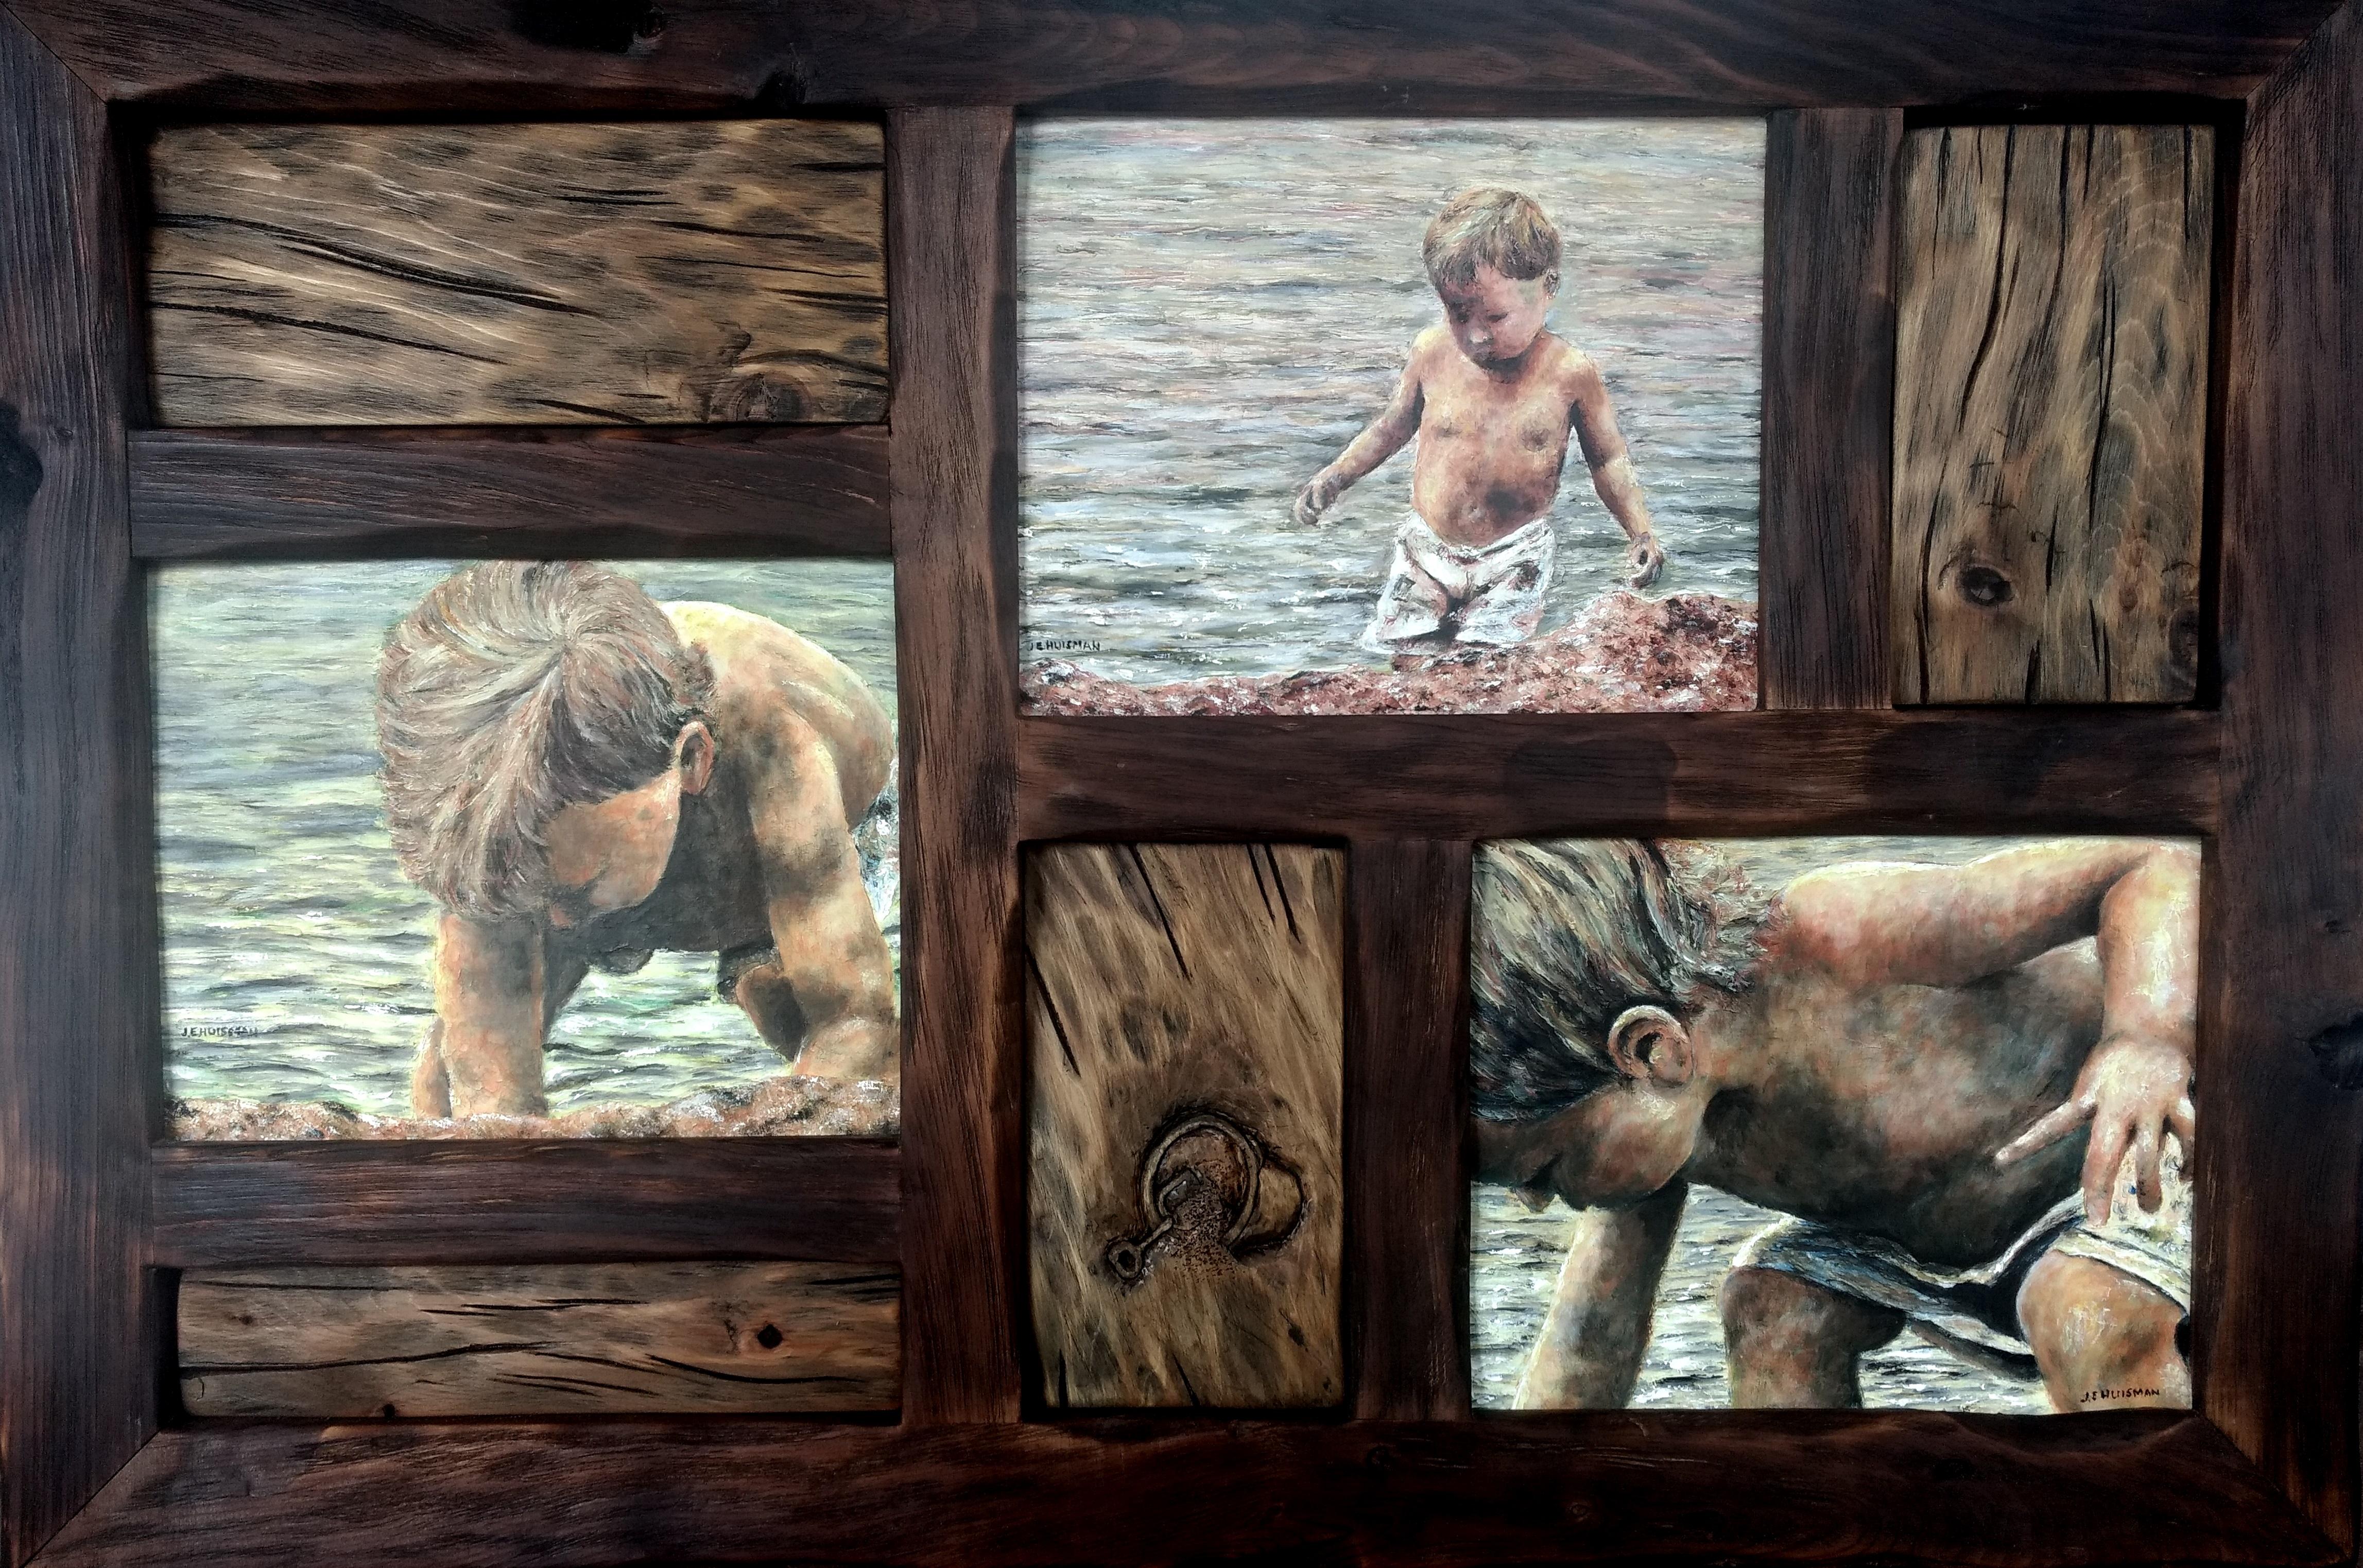 Driftwood, Sand, Gravity, 34x20 Oil & wood by John Huisman